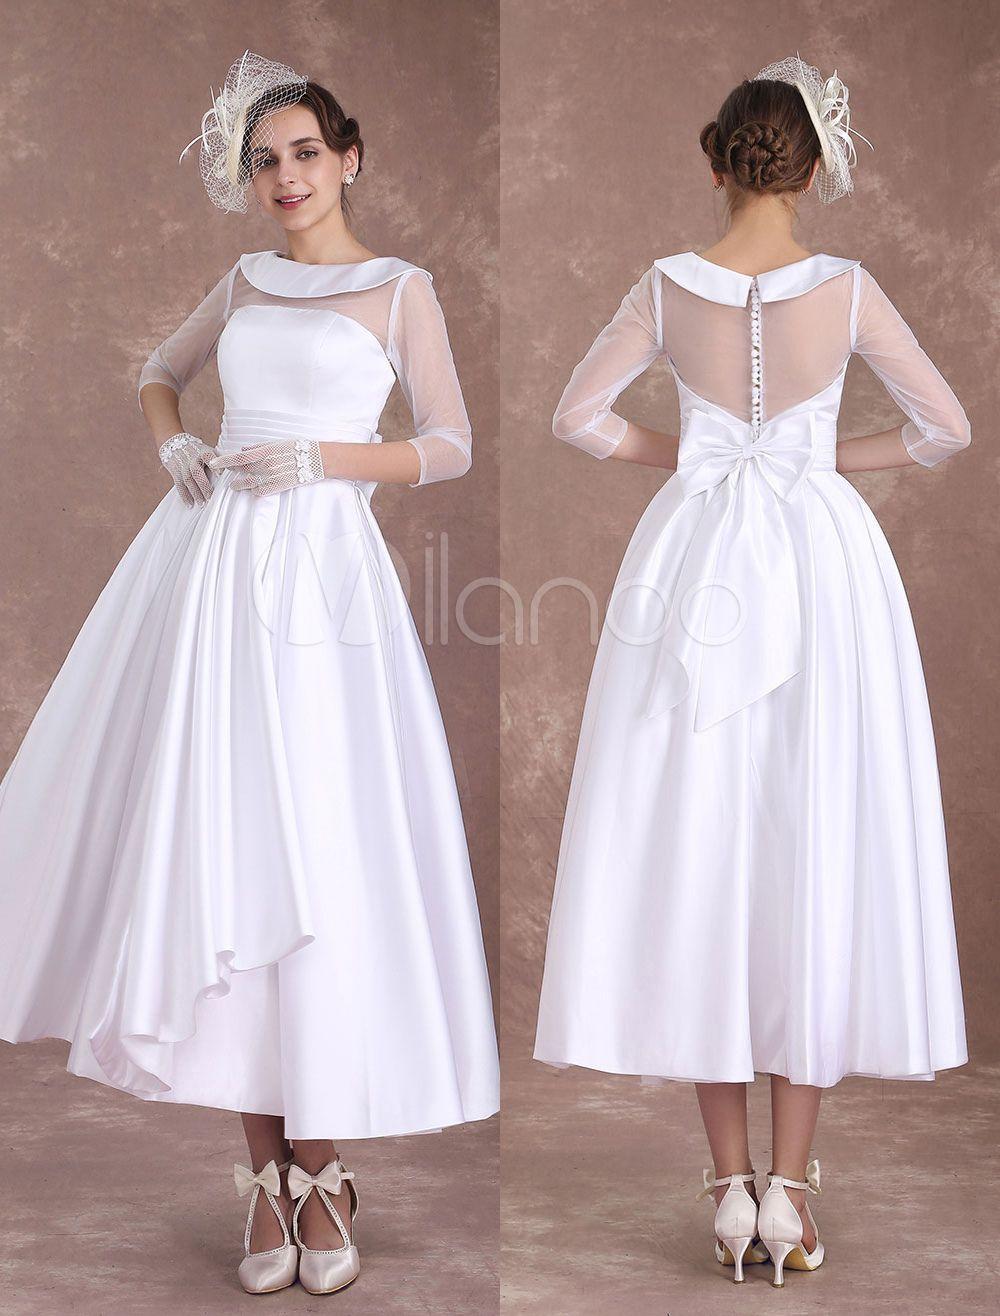 White Wedding Dresses Short 1950 S Vintage Bridal Dress Satin Long Sleeve Pleated Illusion T Wedding Reception Dress Bridal Dresses Vintage Short Wedding Dress [ 1316 x 1000 Pixel ]